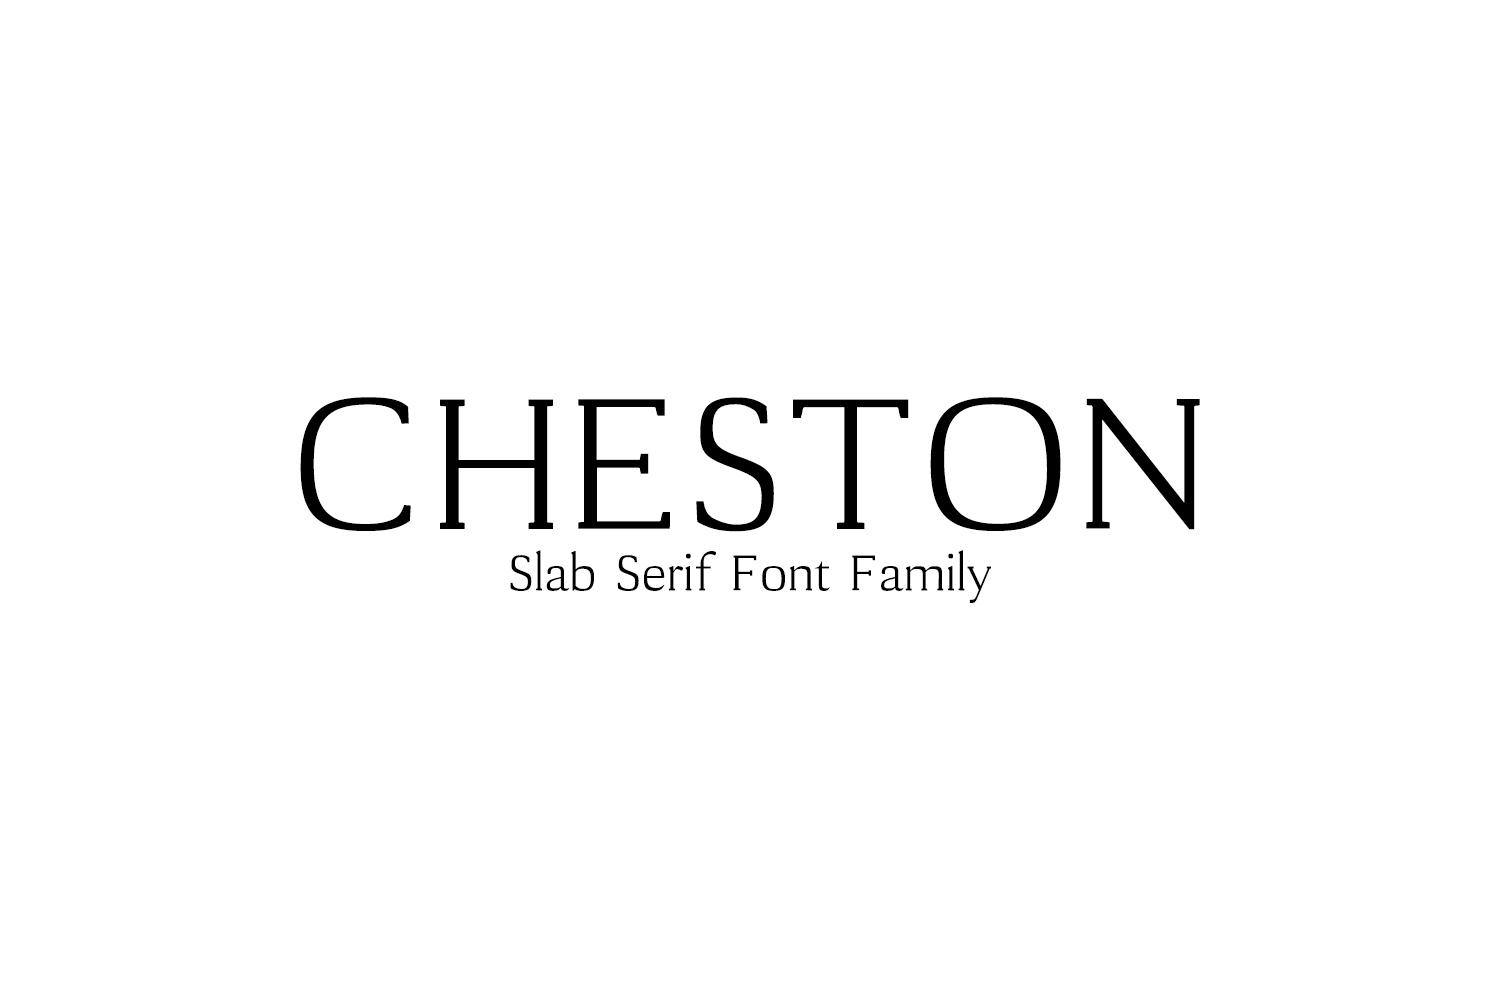 Cheston Slab Serif 5 Font Family example image 1